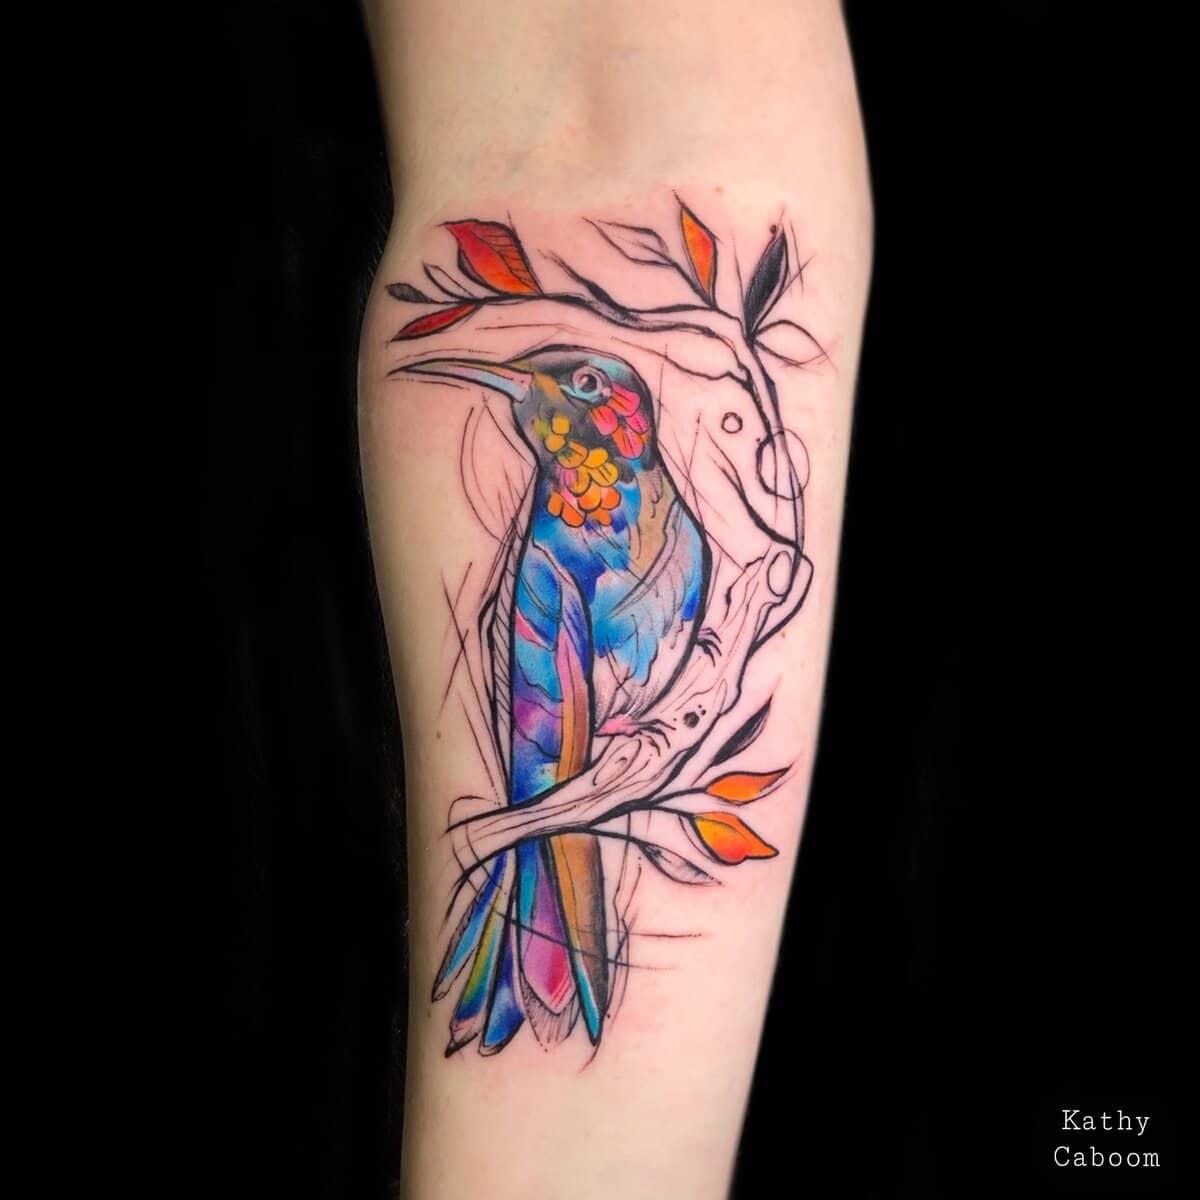 kathycaboom-tattoo-artist-hummingbird-watercolor